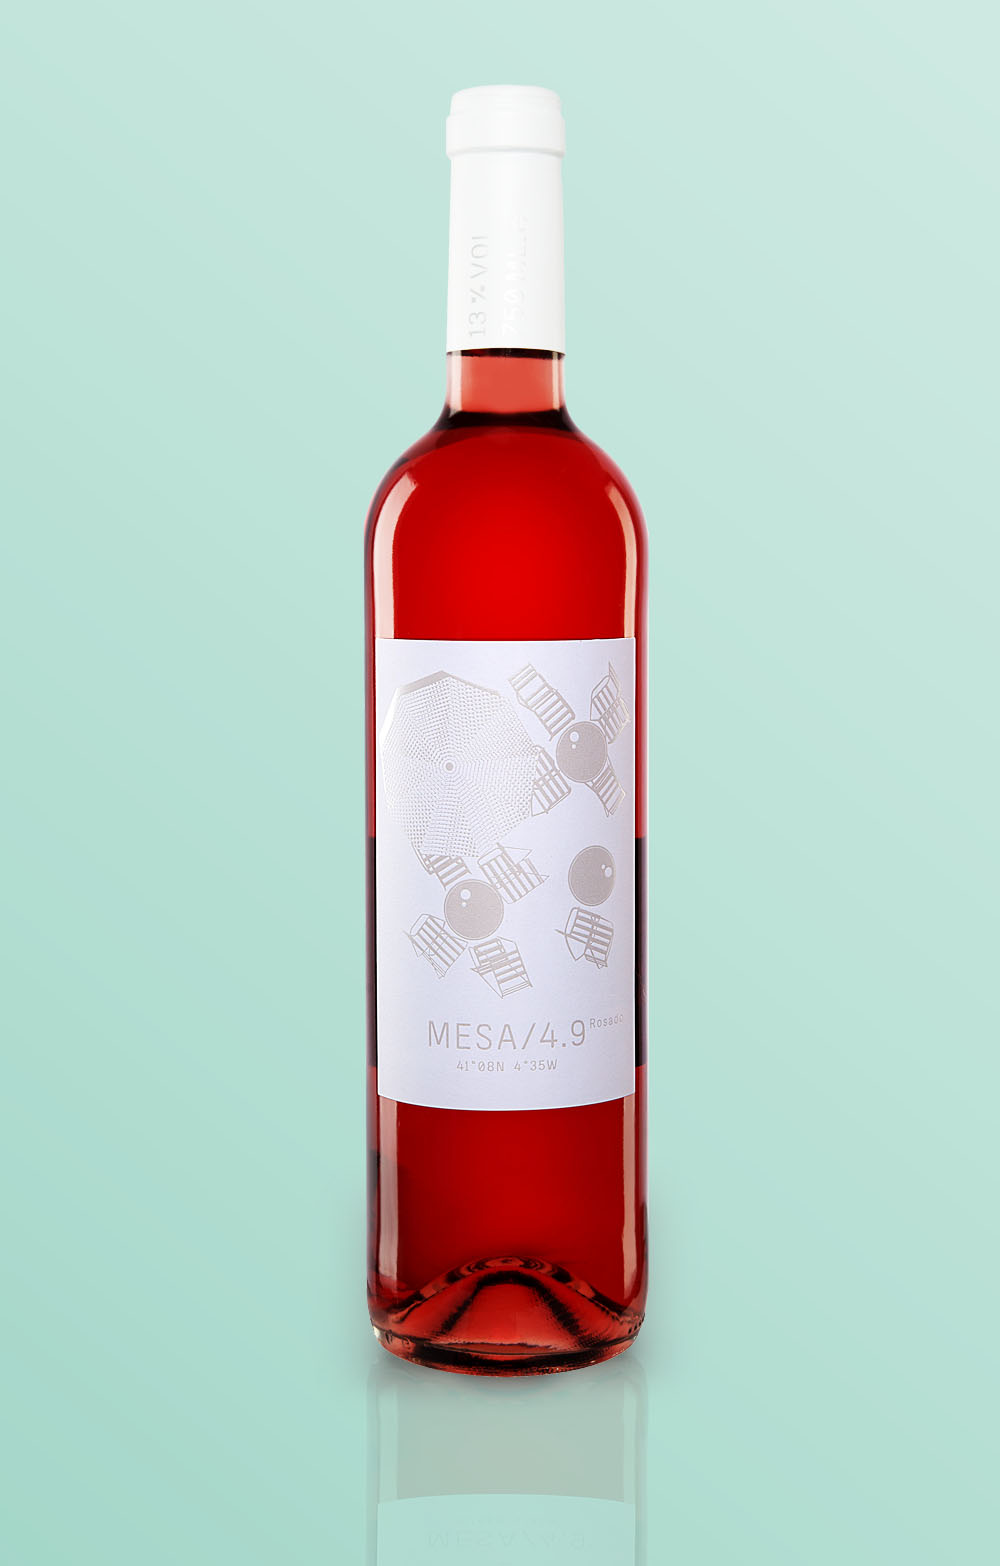 Mesa_4.9-Bottle-02